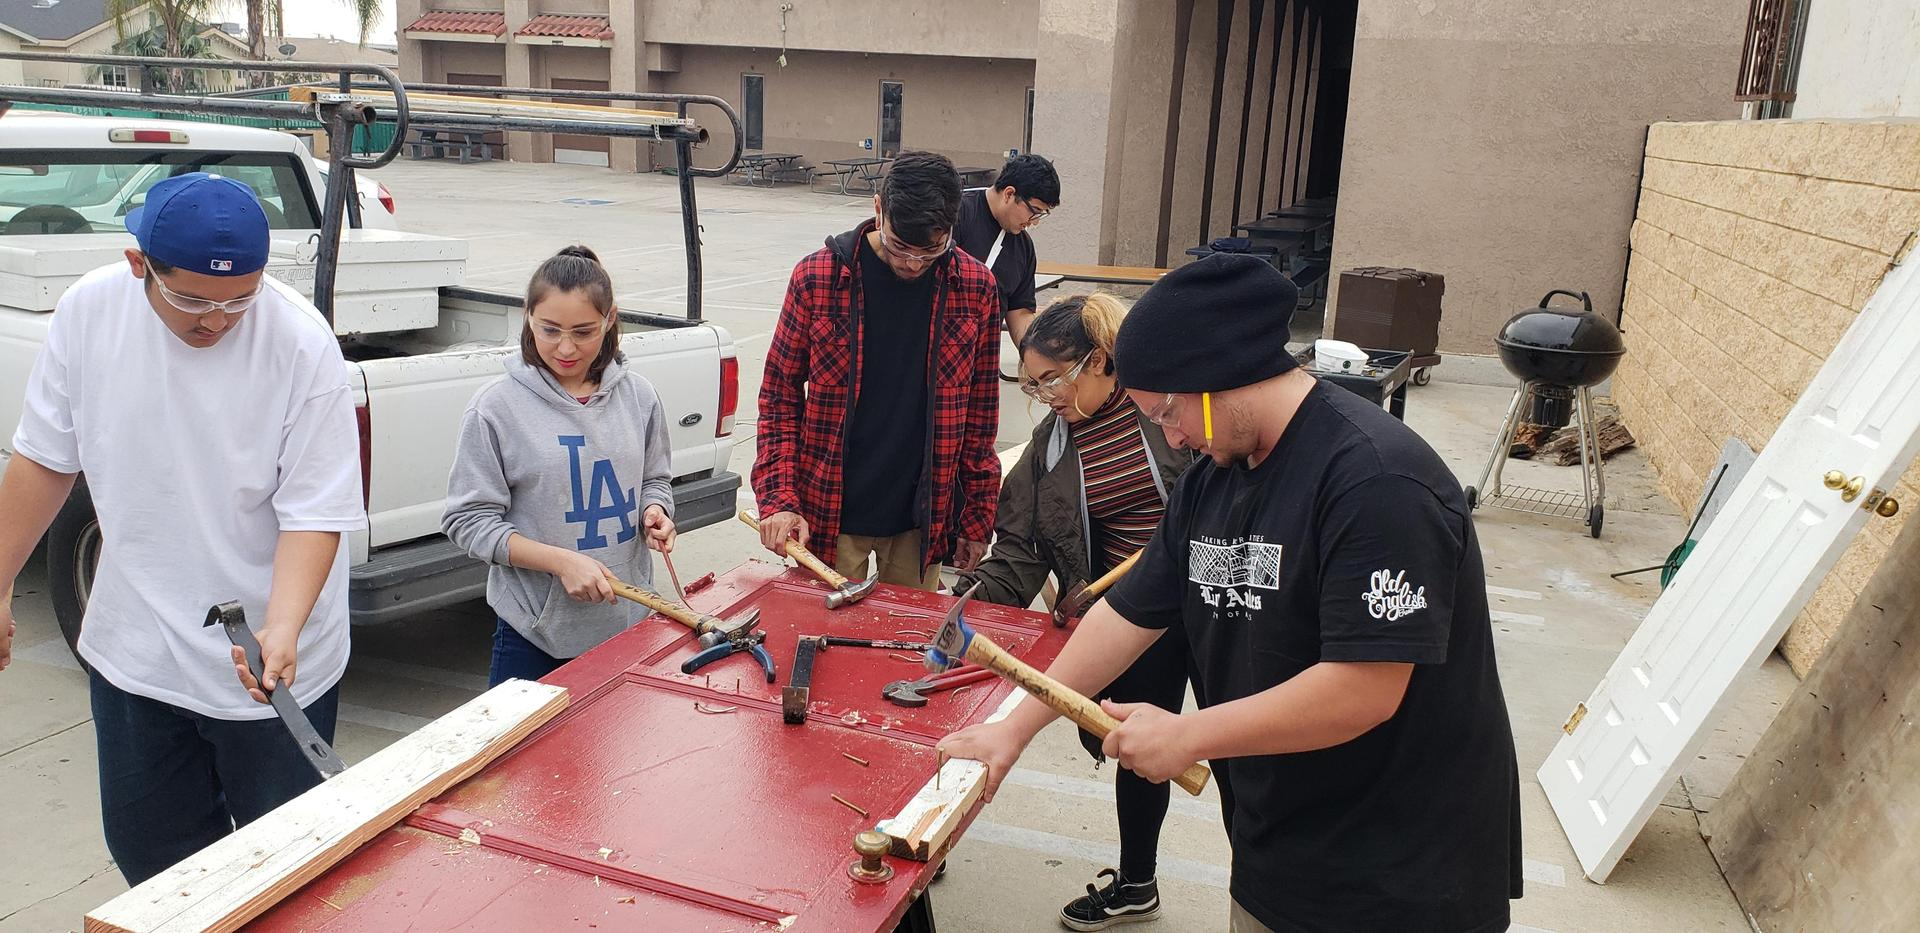 Construction training at LA CAUSA